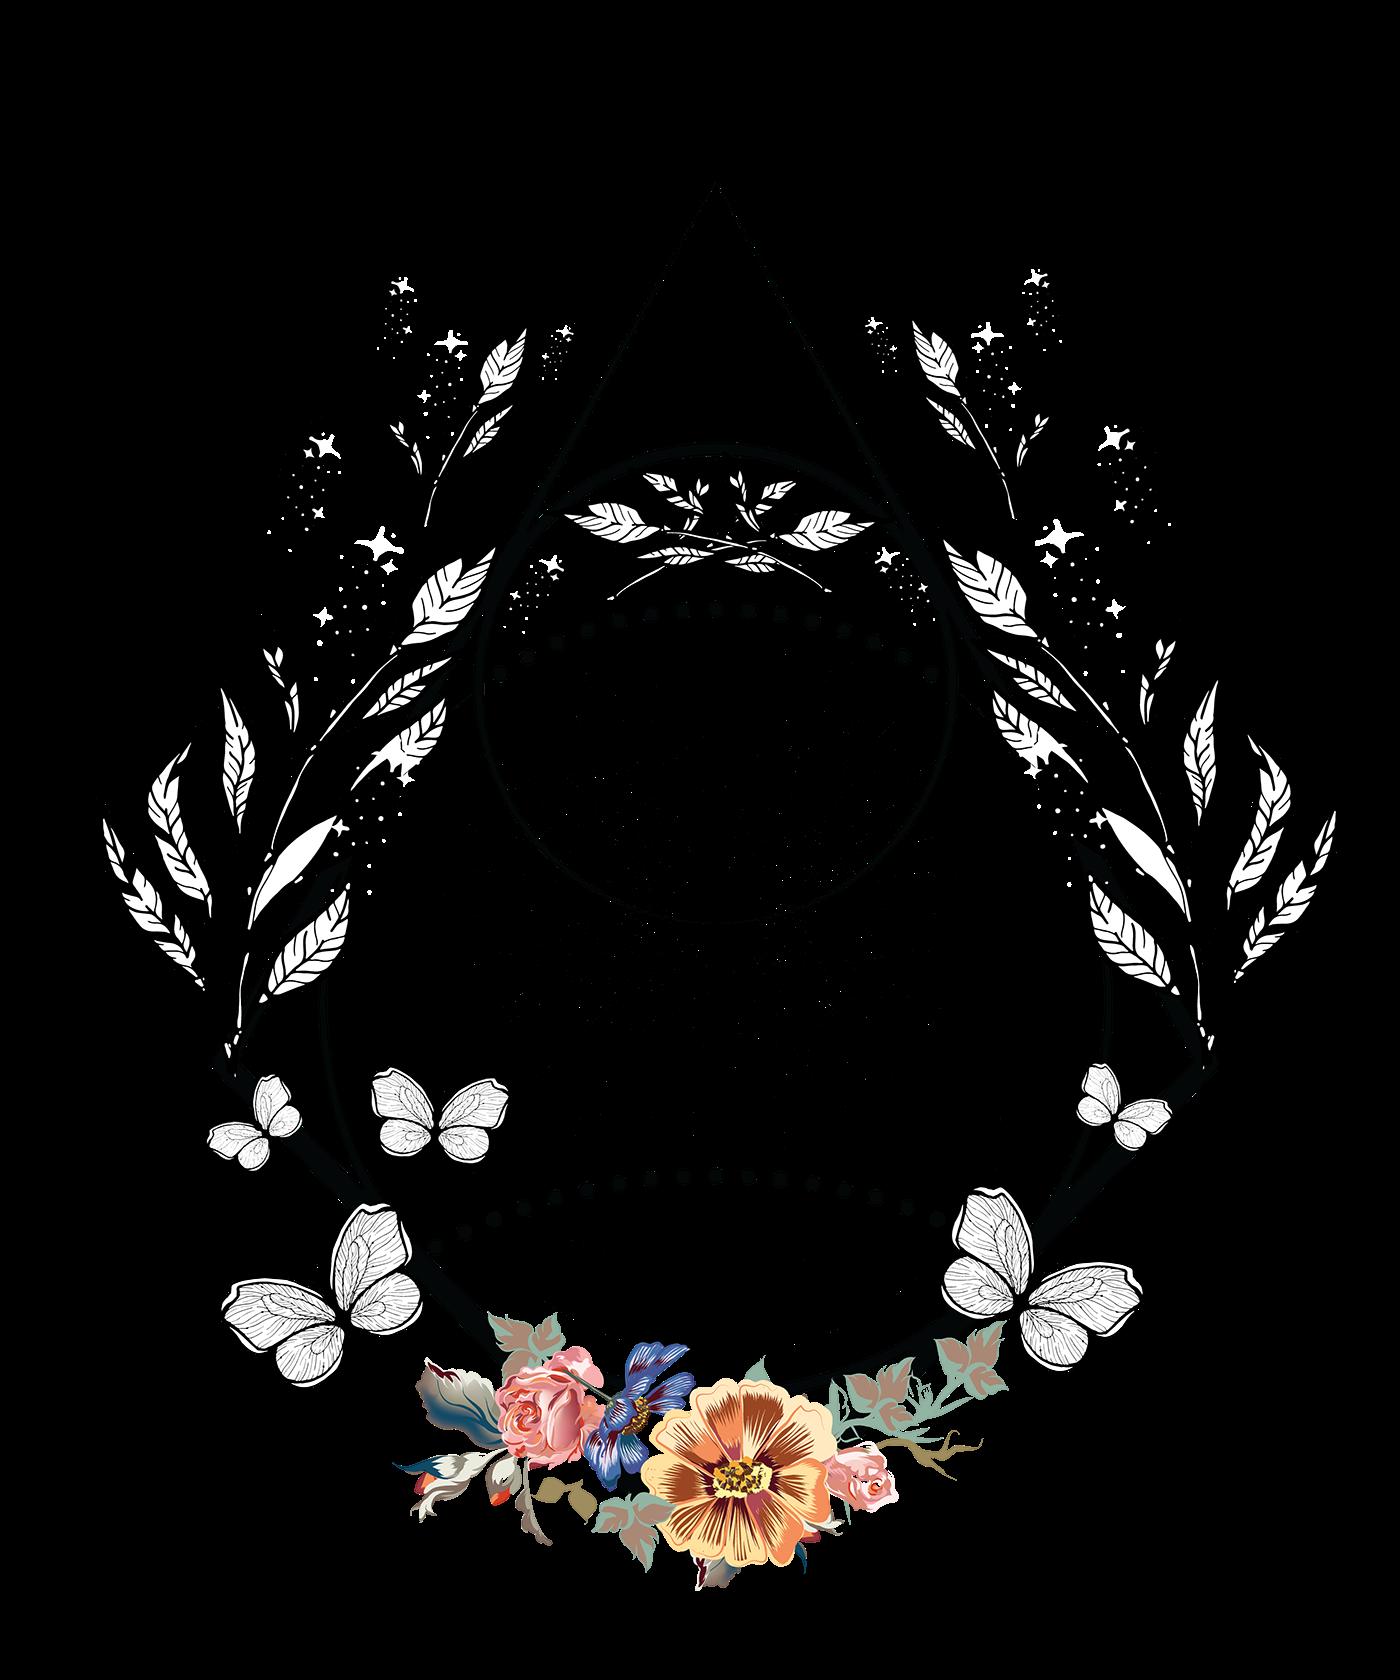 boho designs graphic photoshop